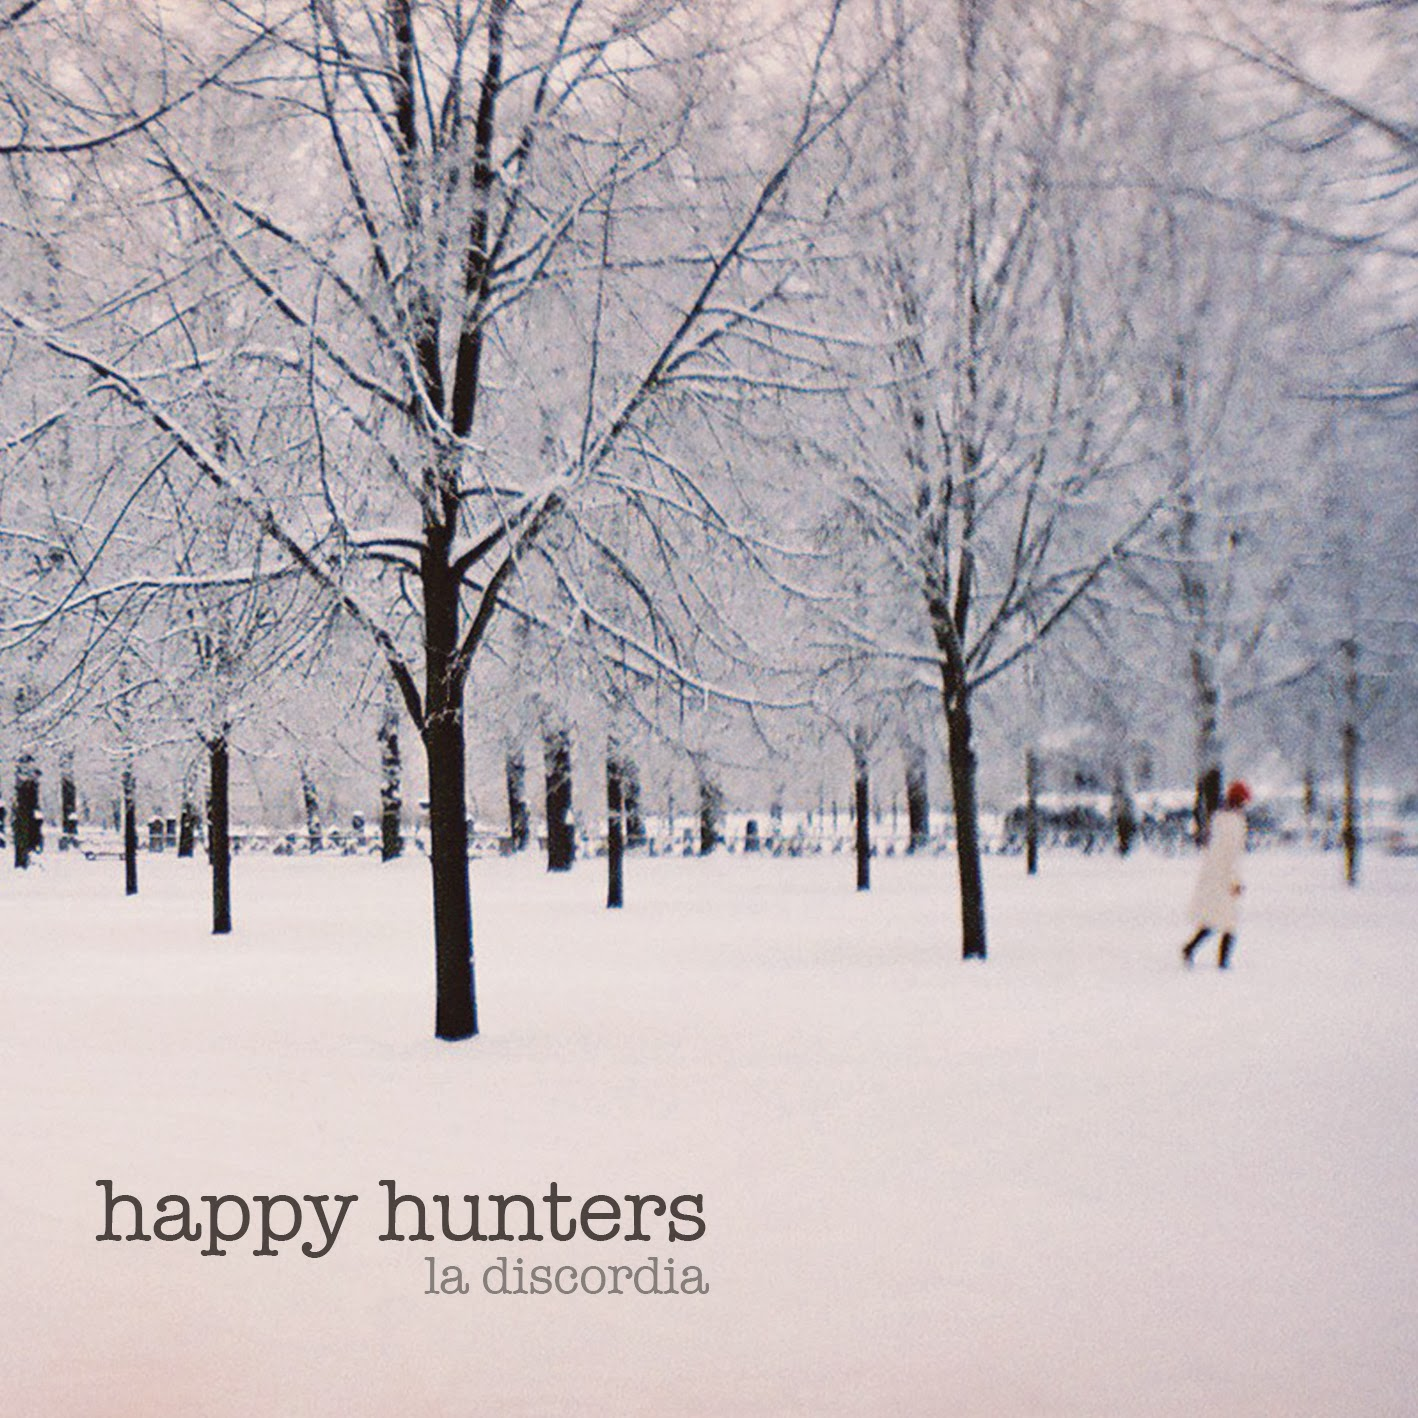 The Happy Hunters La discordia